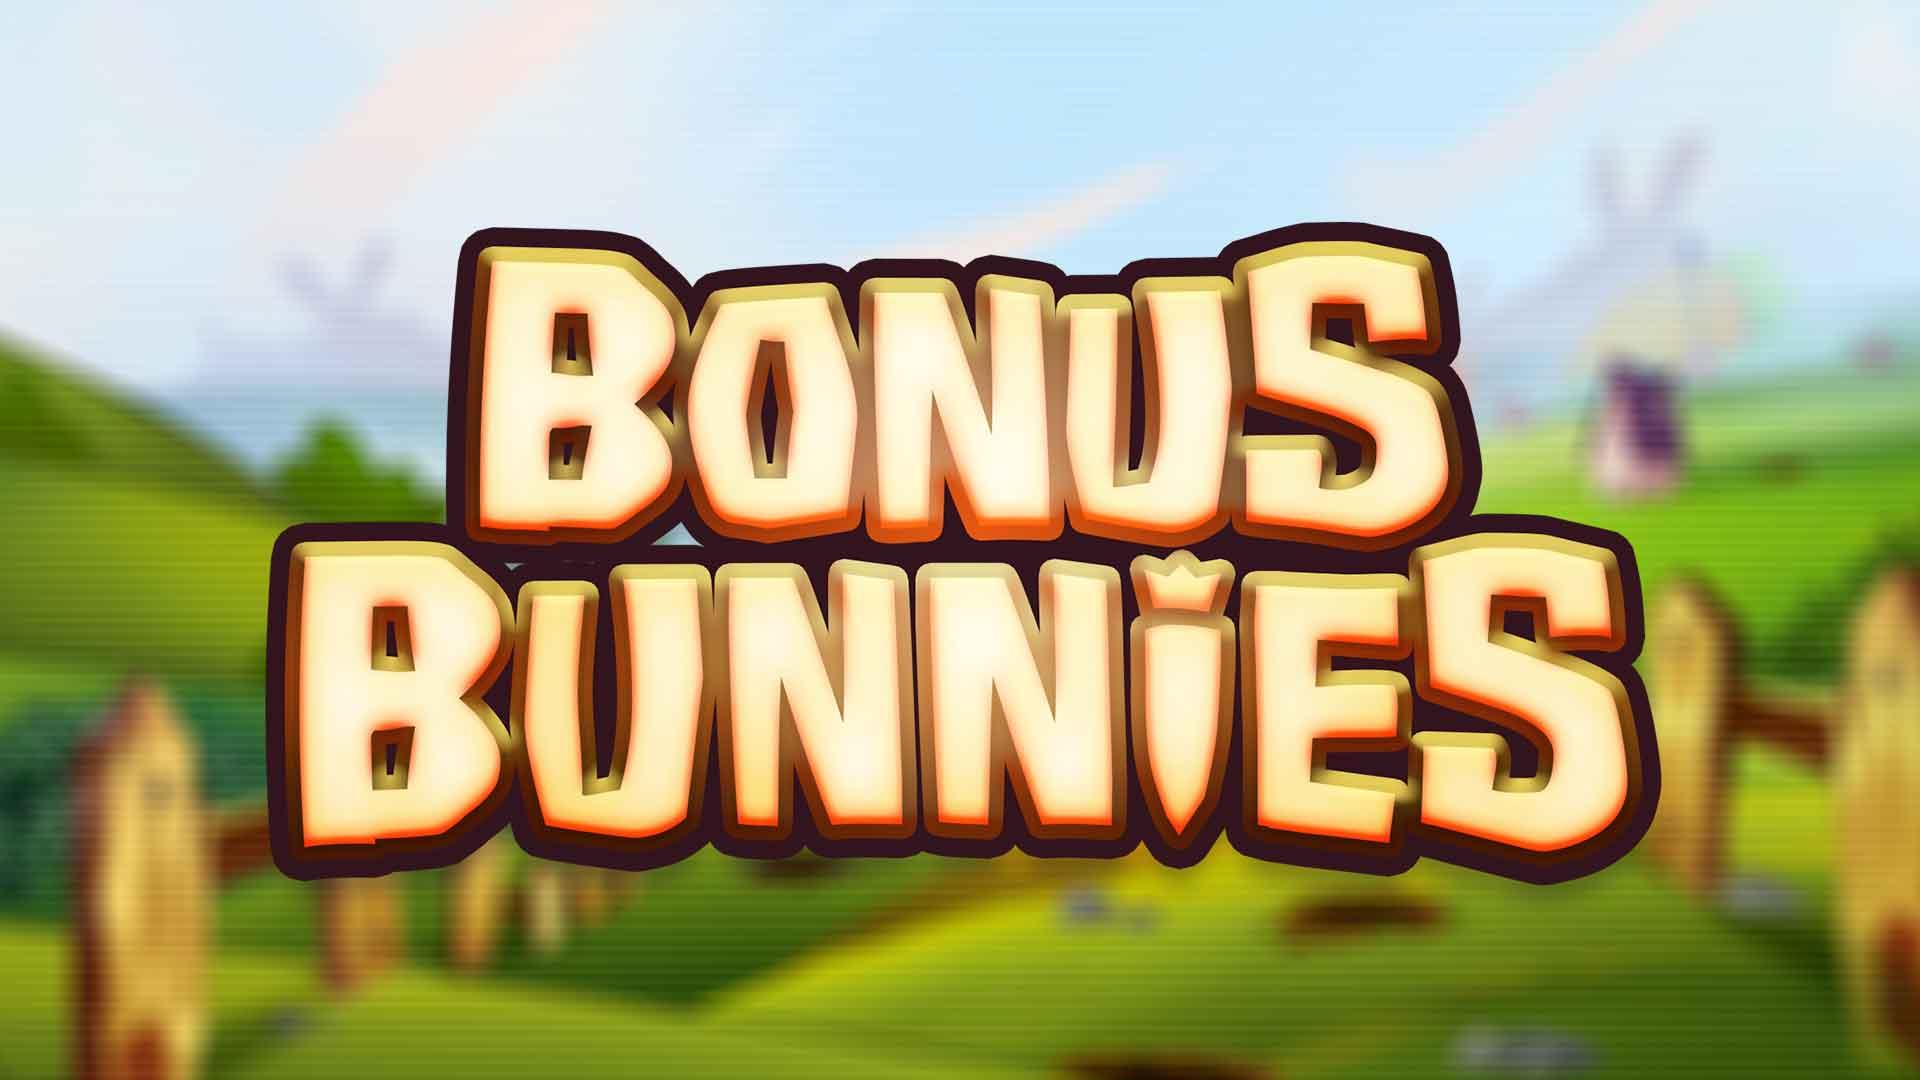 Bonus Bunnies logo